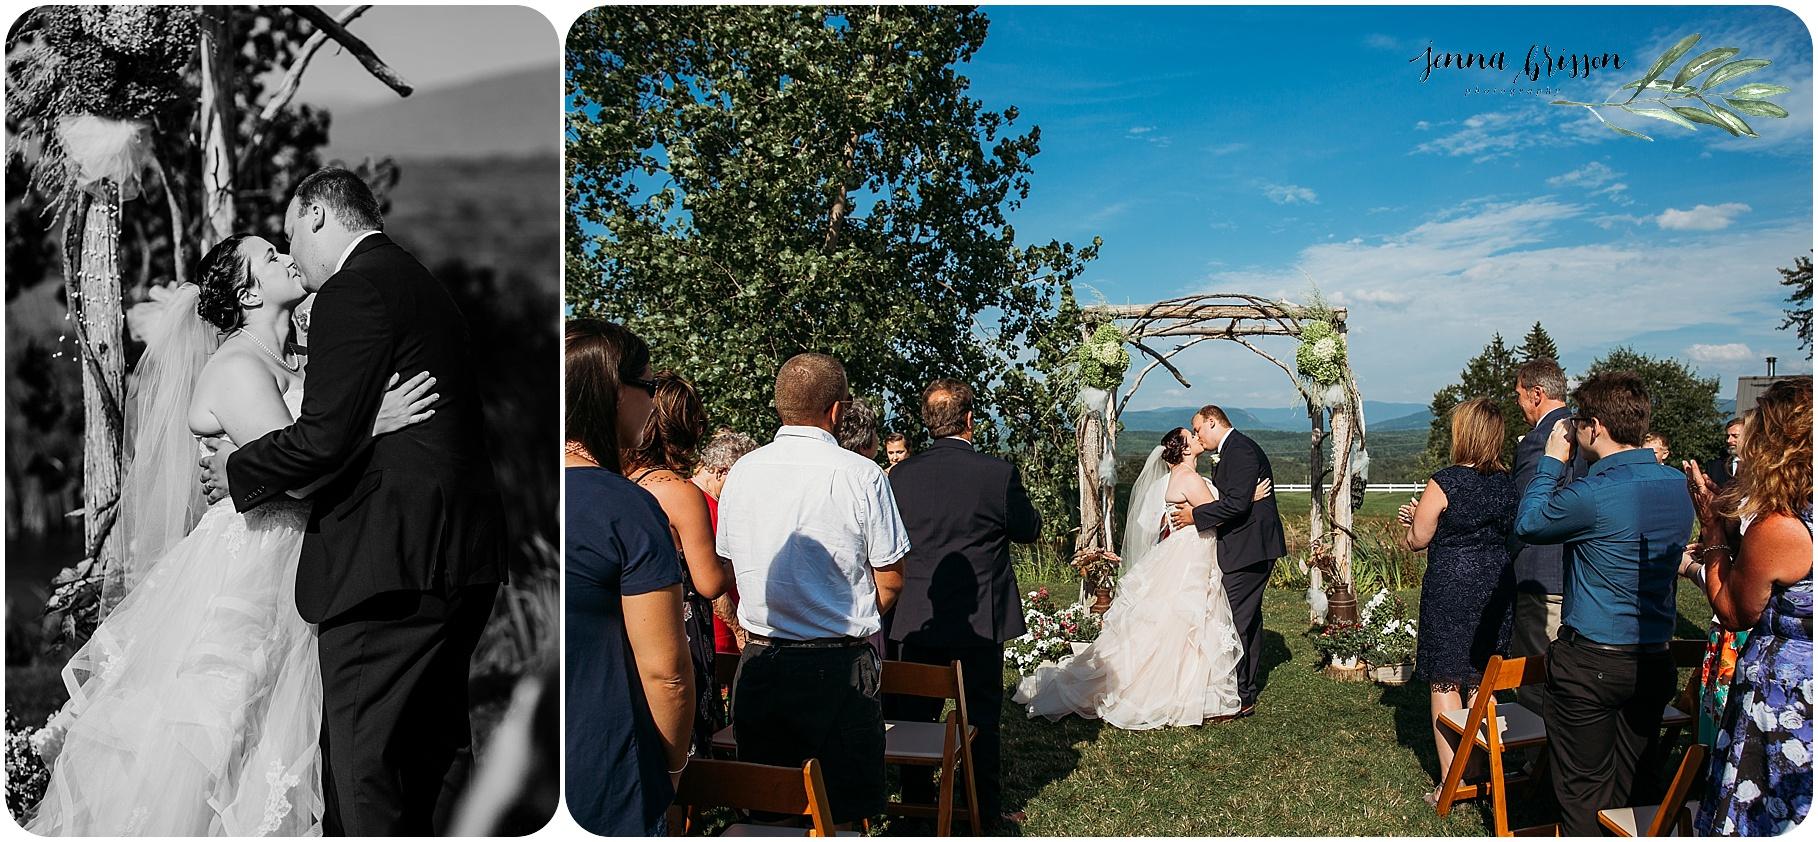 The First Kiss Vermont Wedding - Jenna Brisson